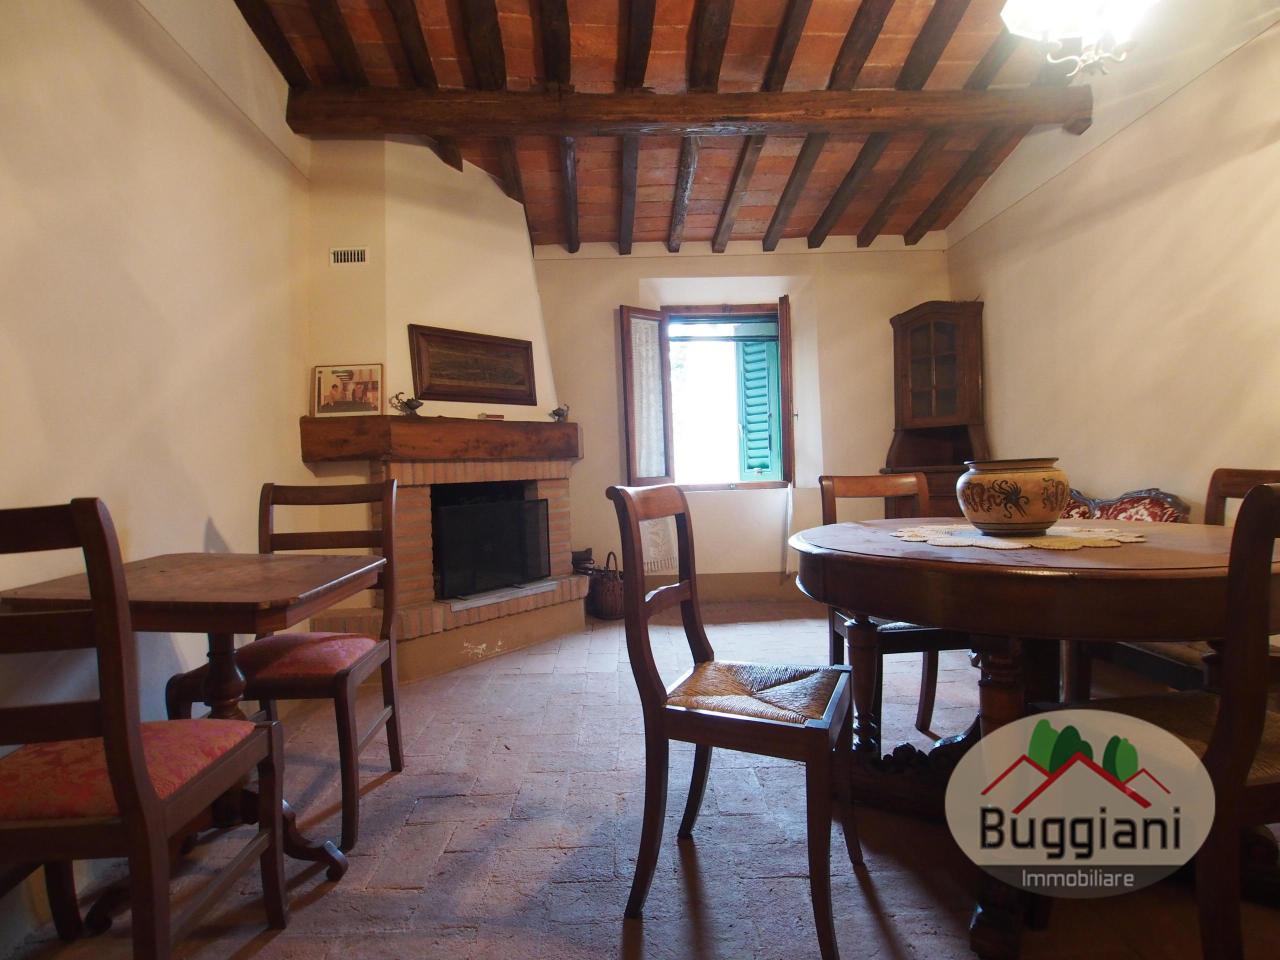 Appartamento in vendita RIF. 2252, Montopoli in Val d'Arno (PI)